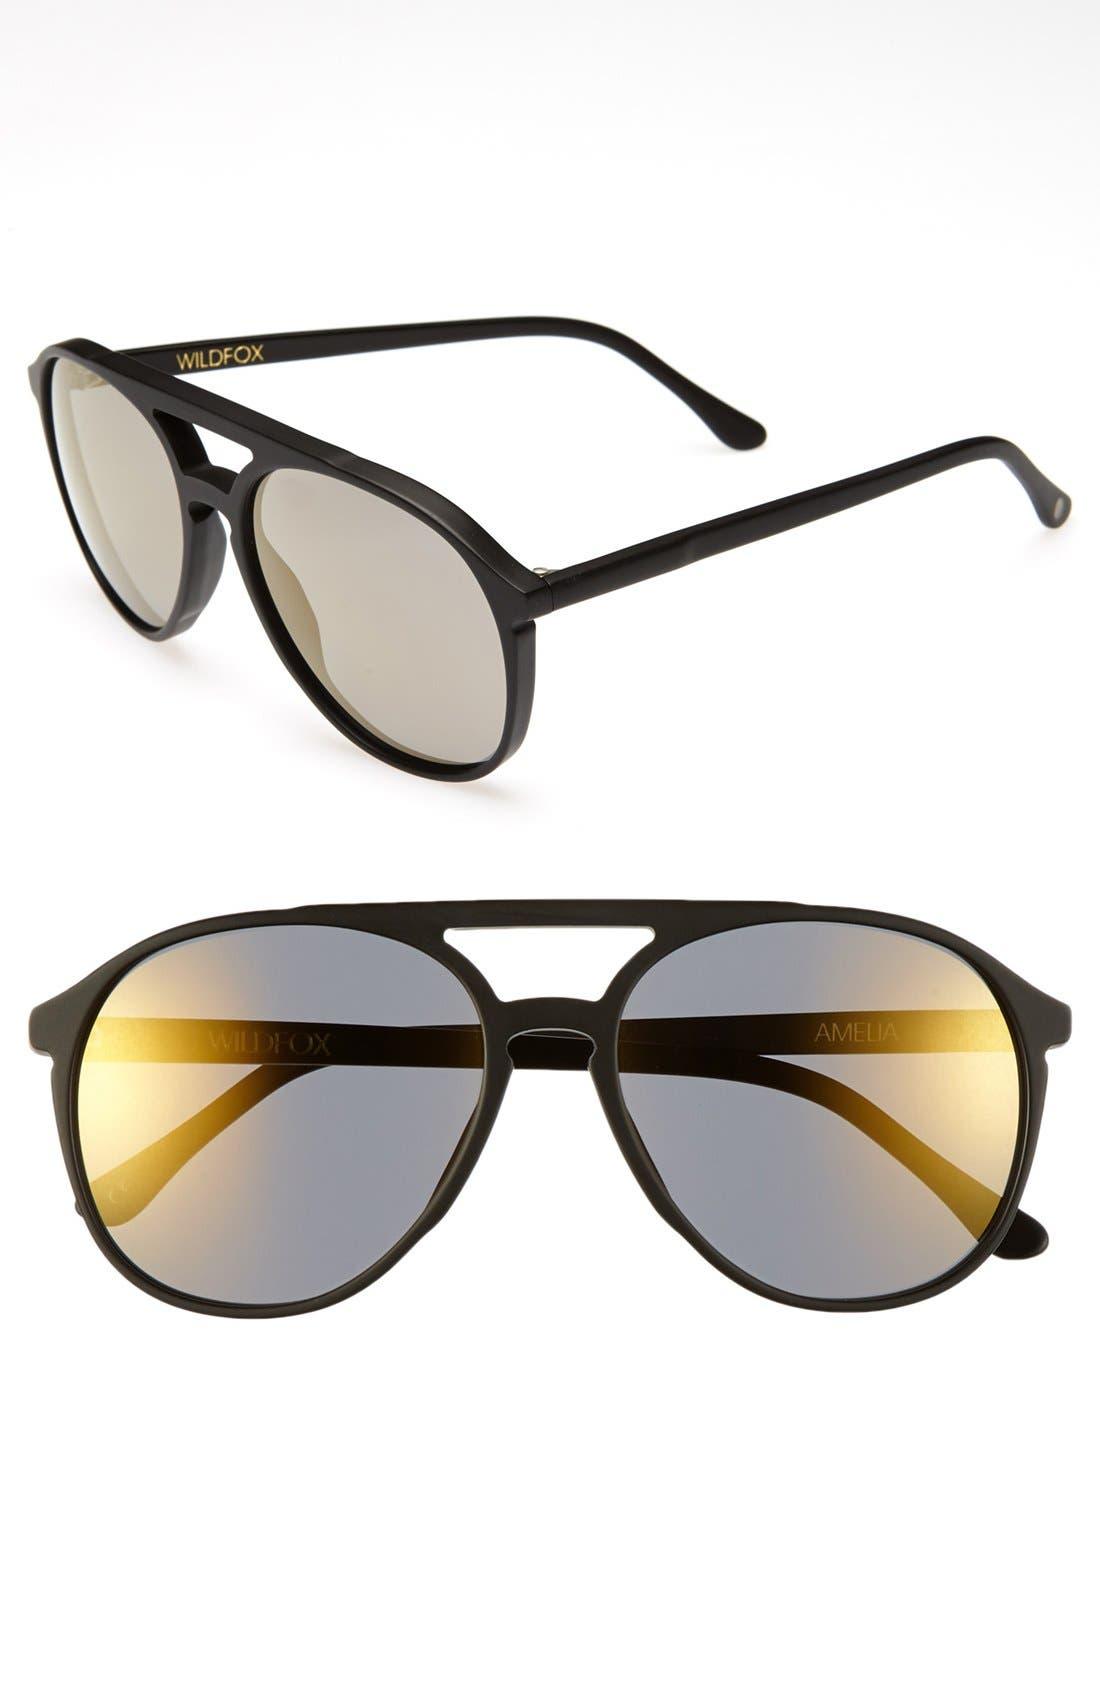 Main Image - Wildfox 'Amelia Deluxe' Sunglasses